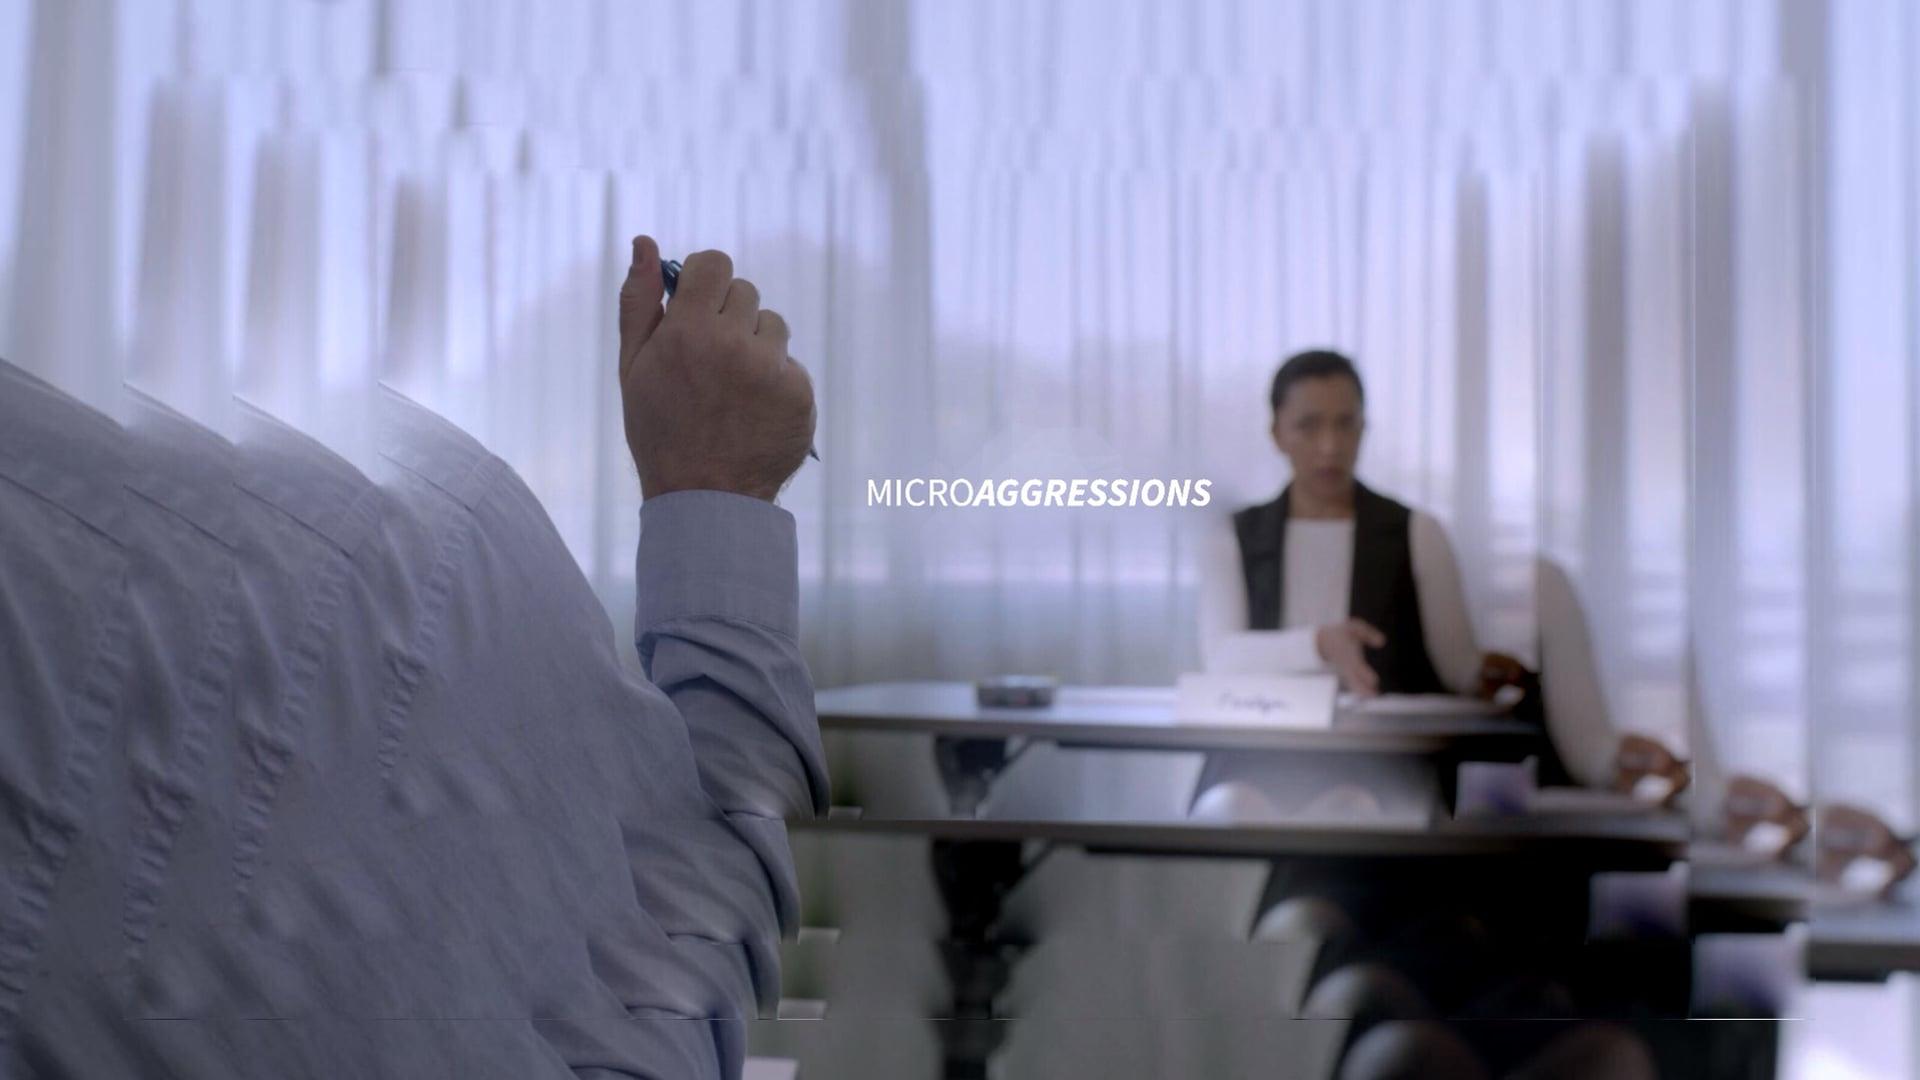 'Microaggressions' web series | Episode 5